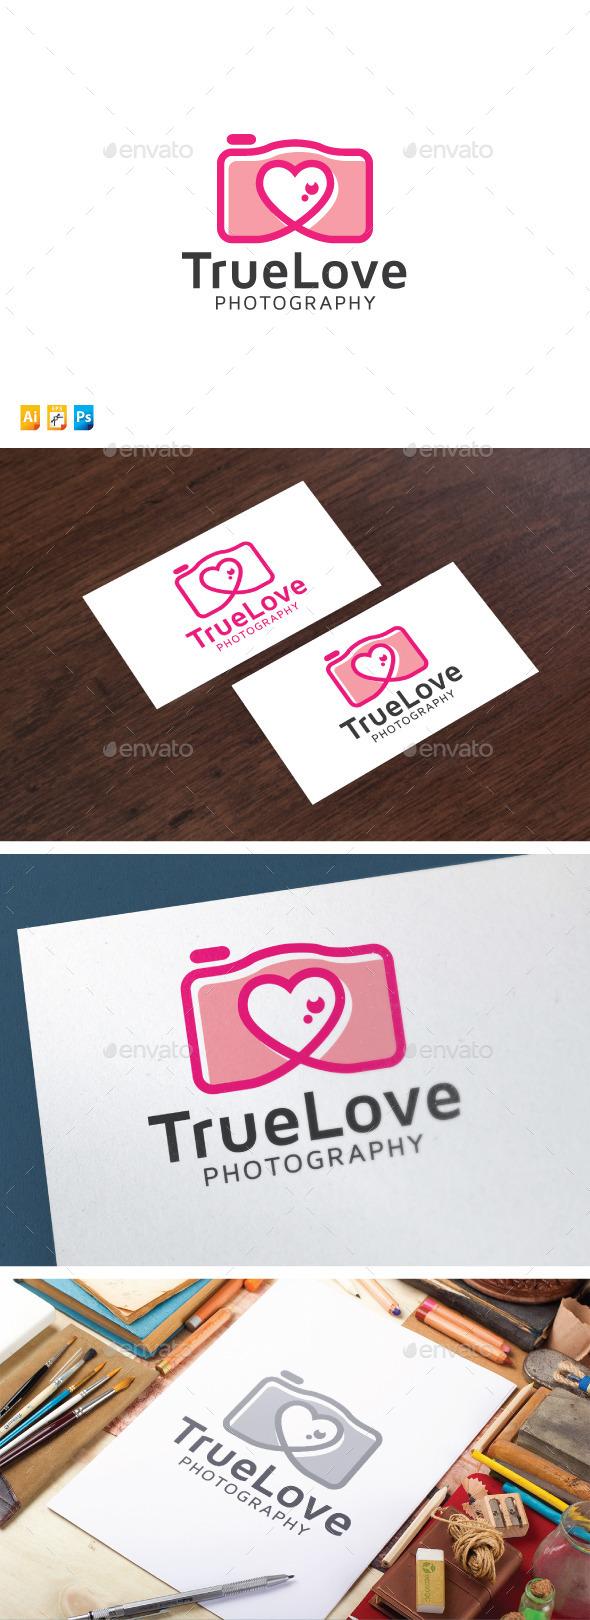 Love Photography Logo - Objects Logo Templates